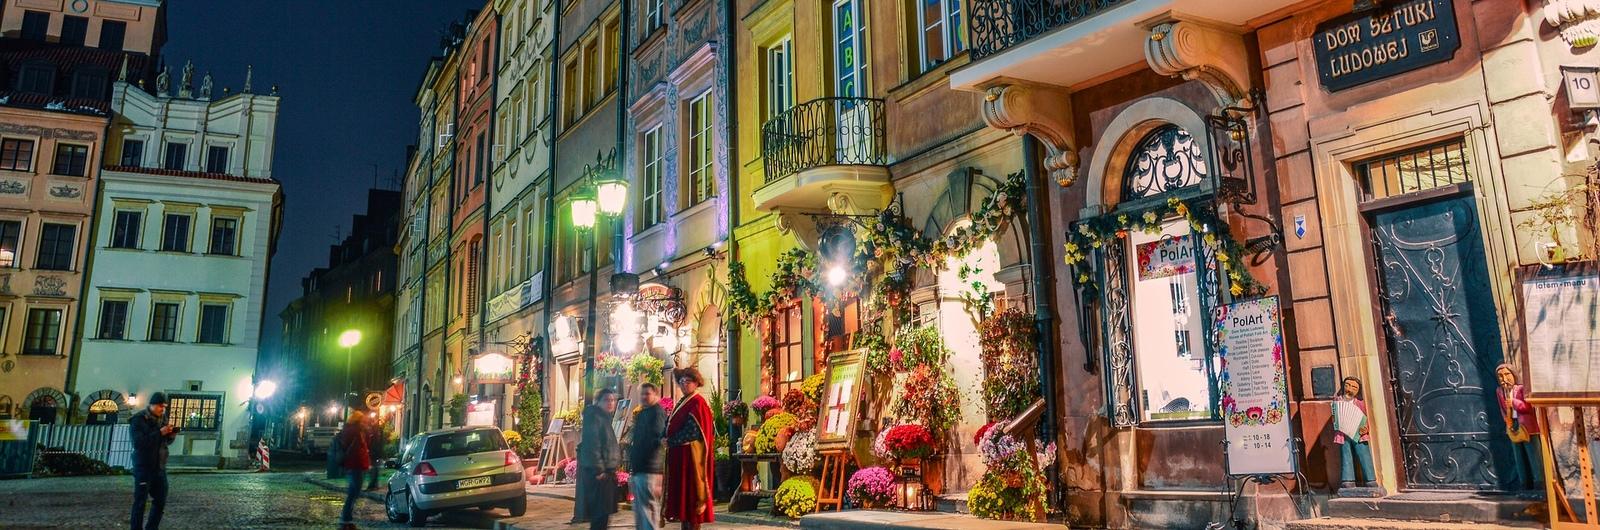 city header poland street night